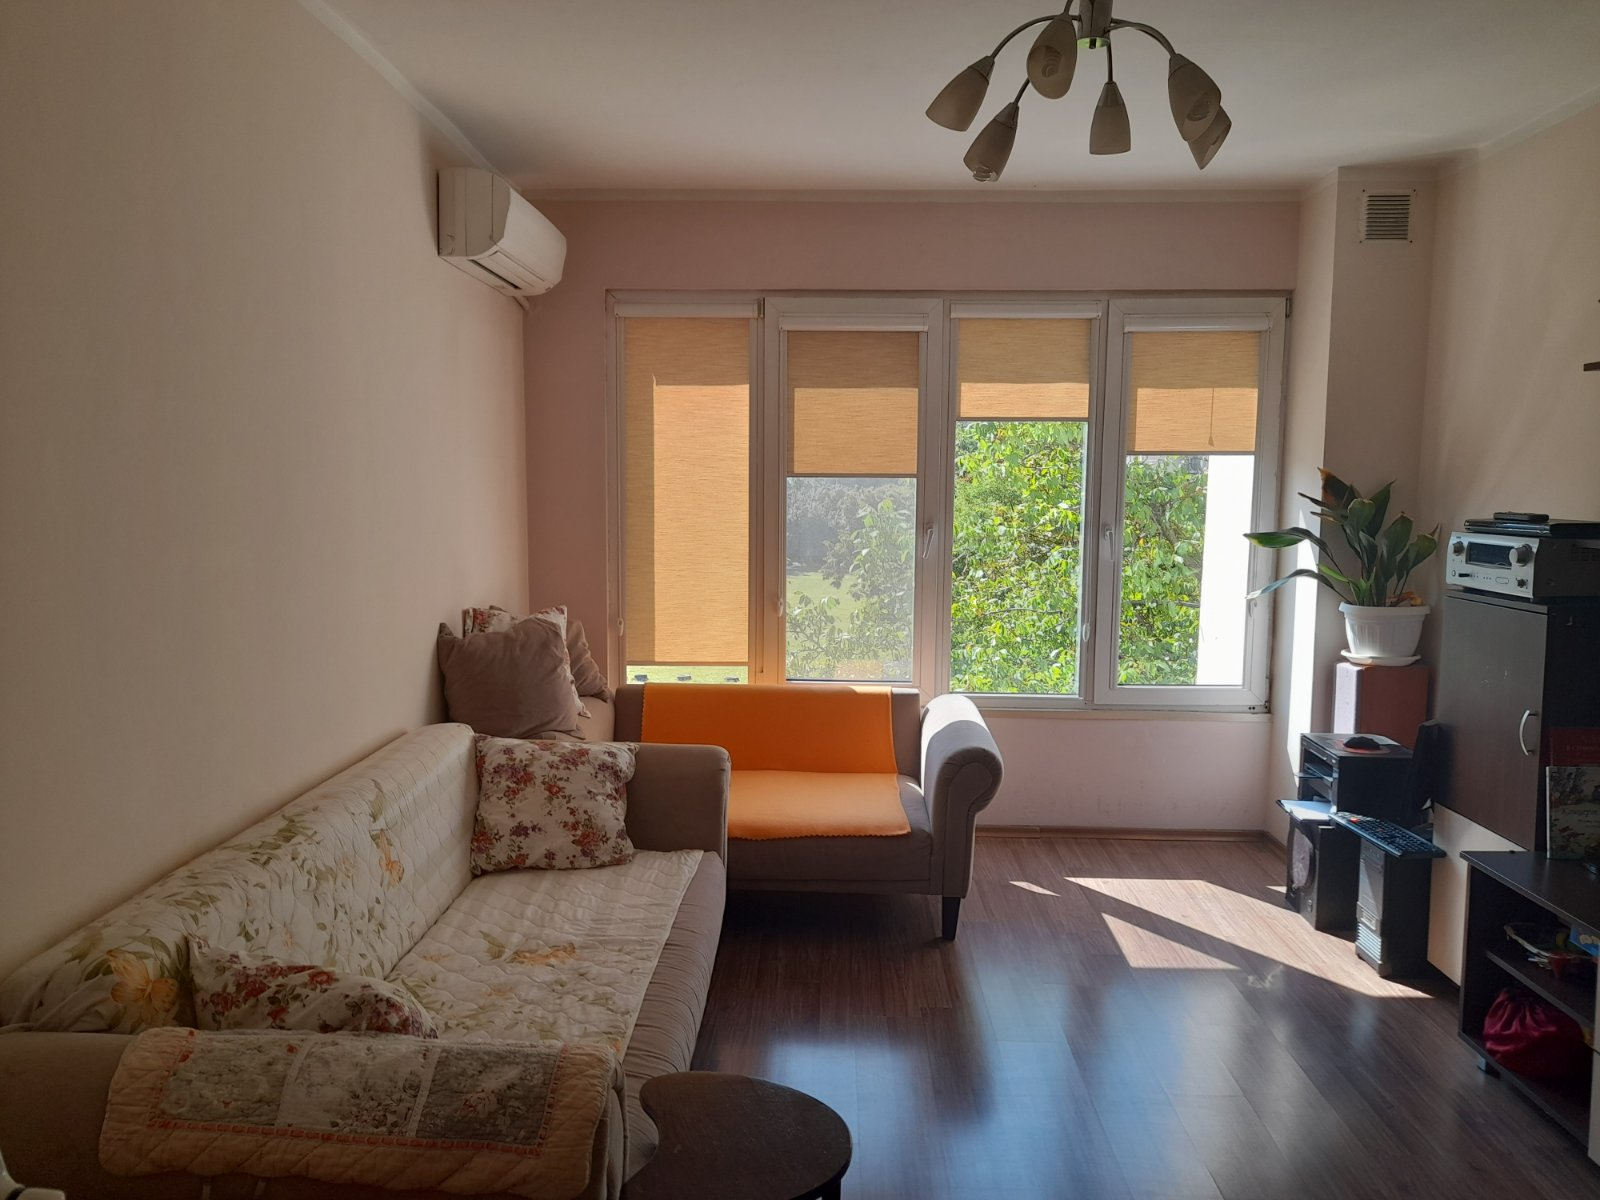 Ситибул Продава тристаен в София, Люлин 10